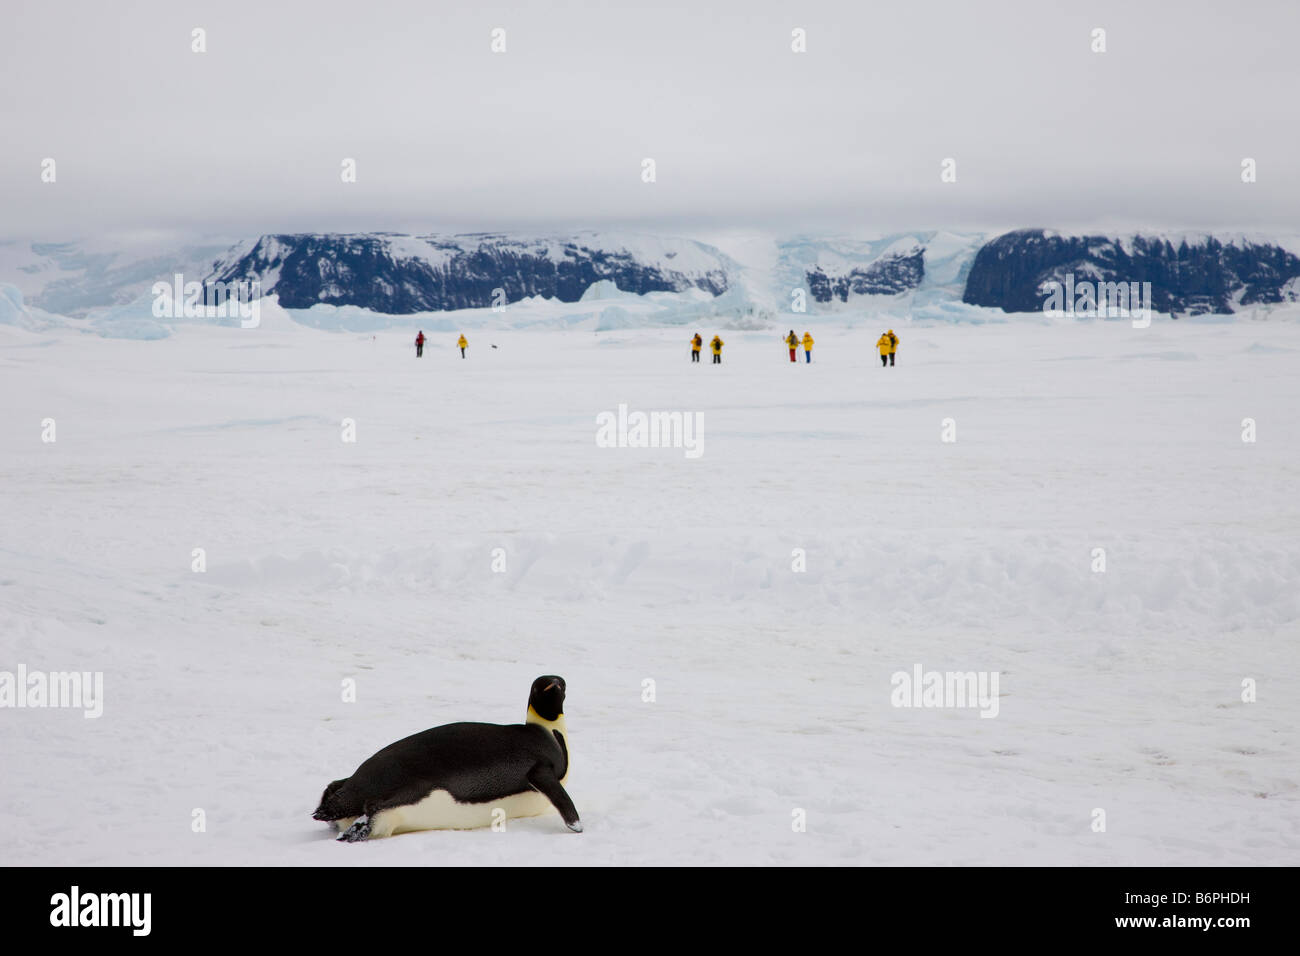 1 Emperor Penguin watches distant ecotourist hikers explore fast ice glacier snow landscape Weddell Sea Antarctica - Stock Image